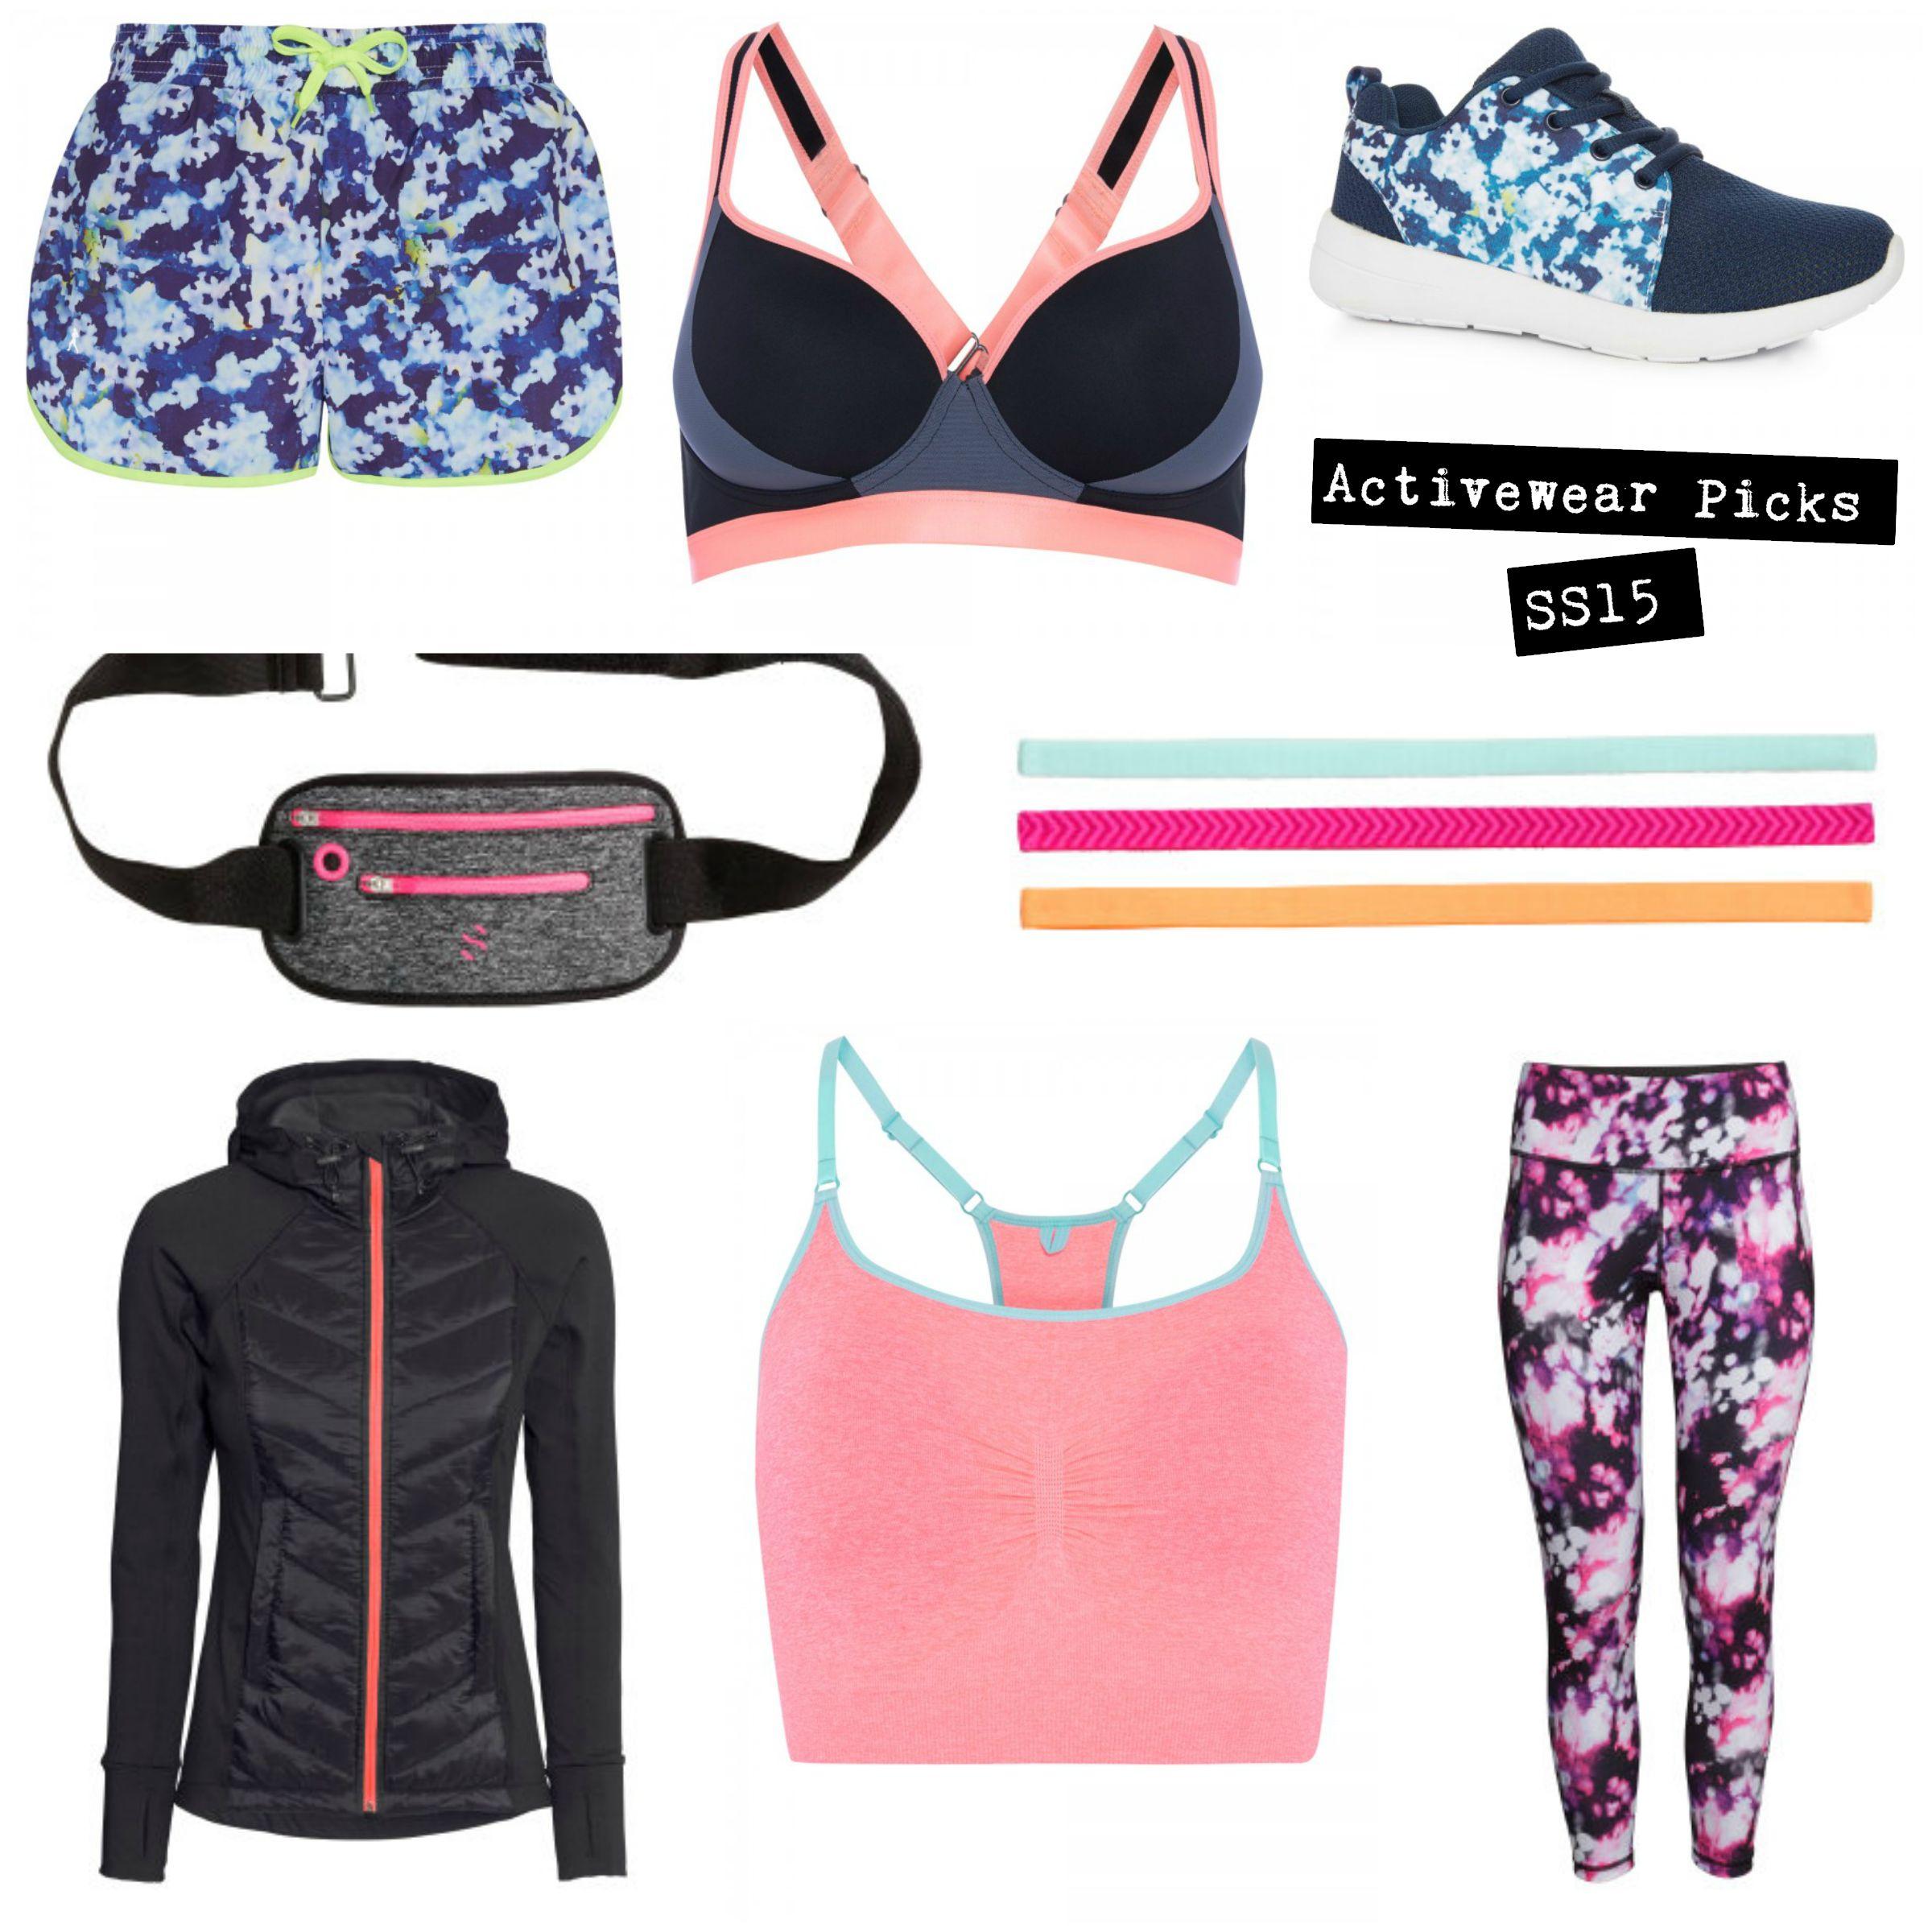 Activewear Picks SS15